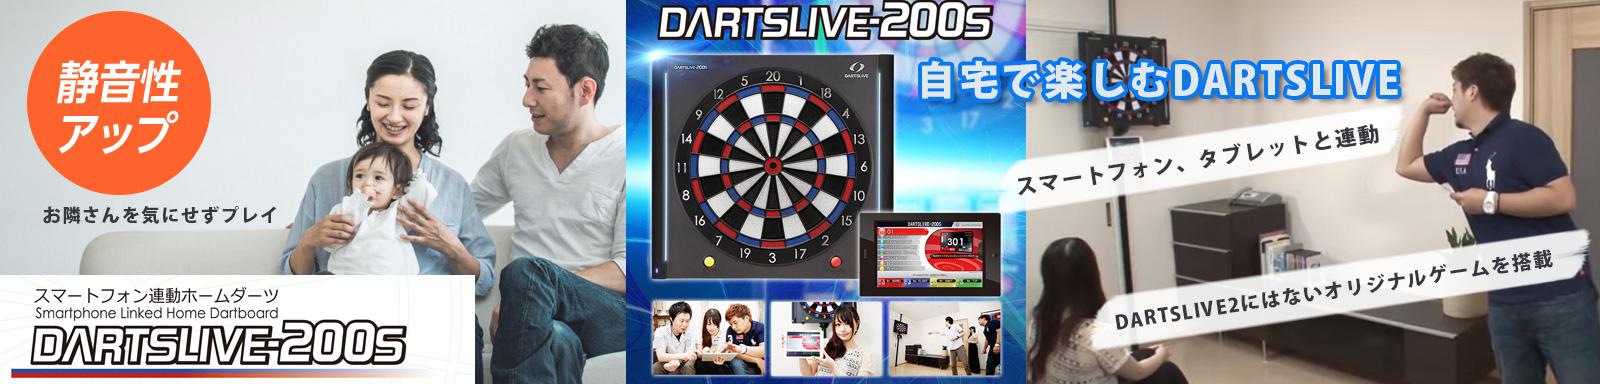 DARTSLIVE200s